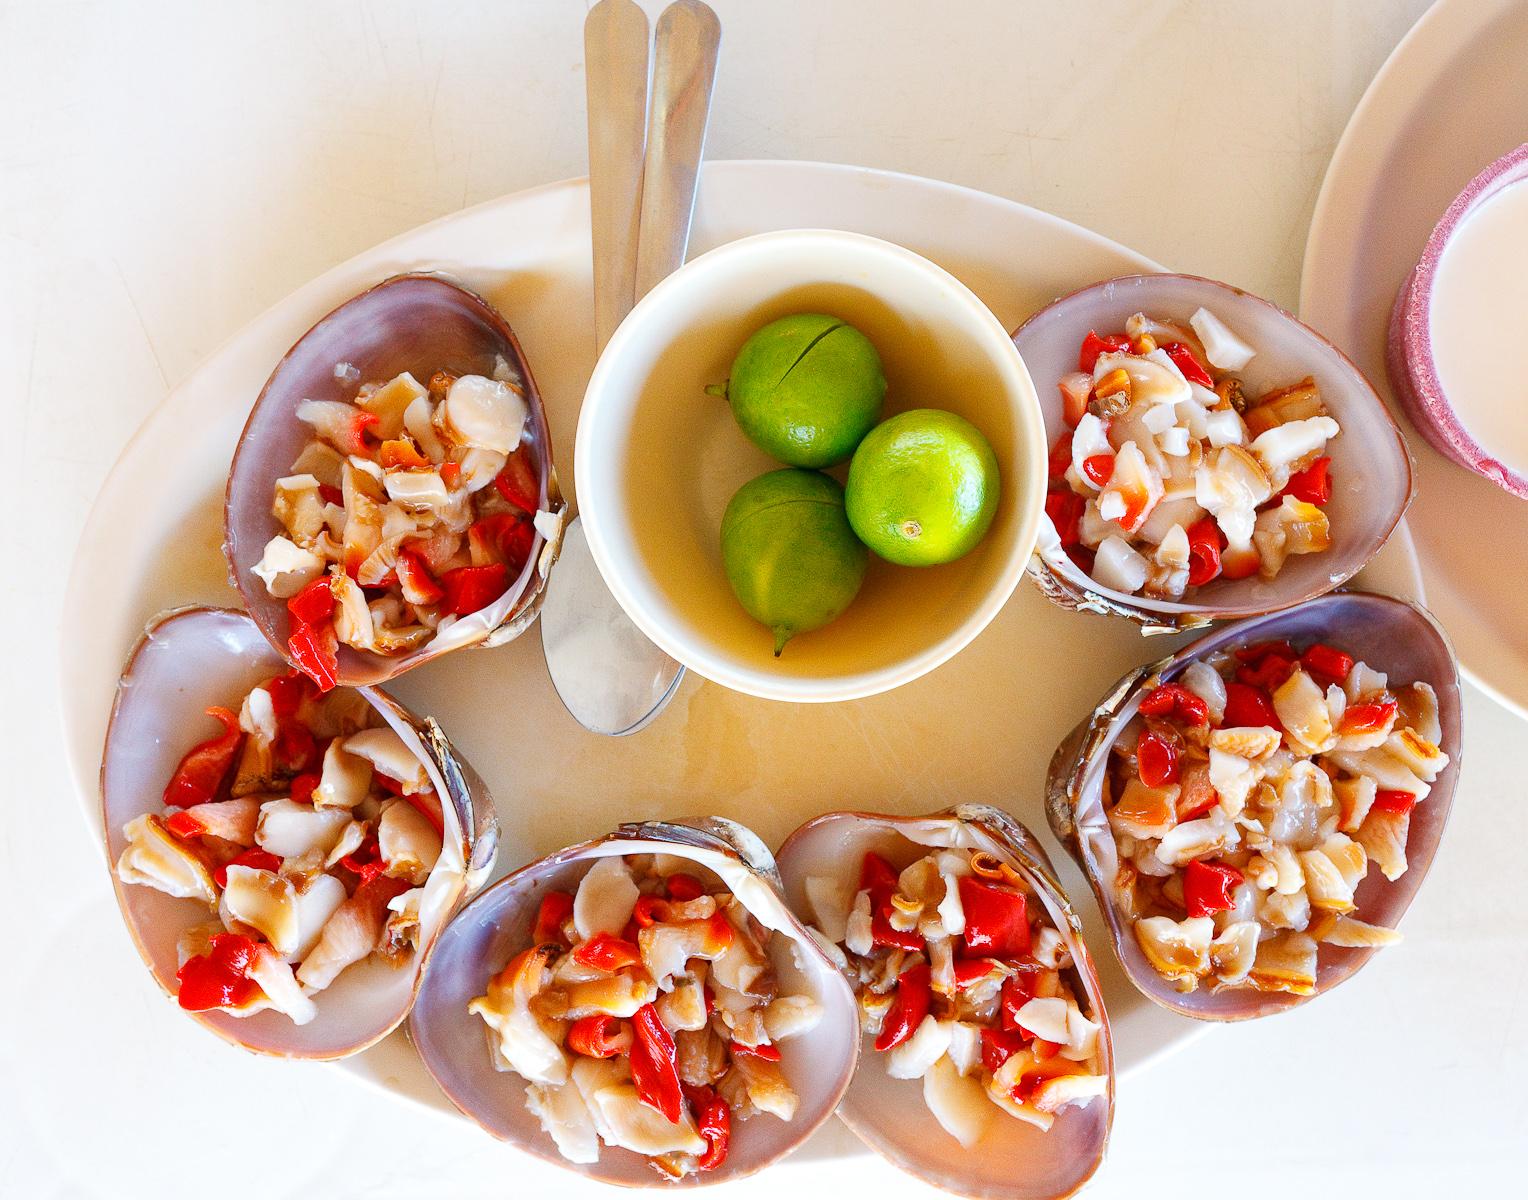 Almejas chocolatas (chocolate clams) (MXP $35)